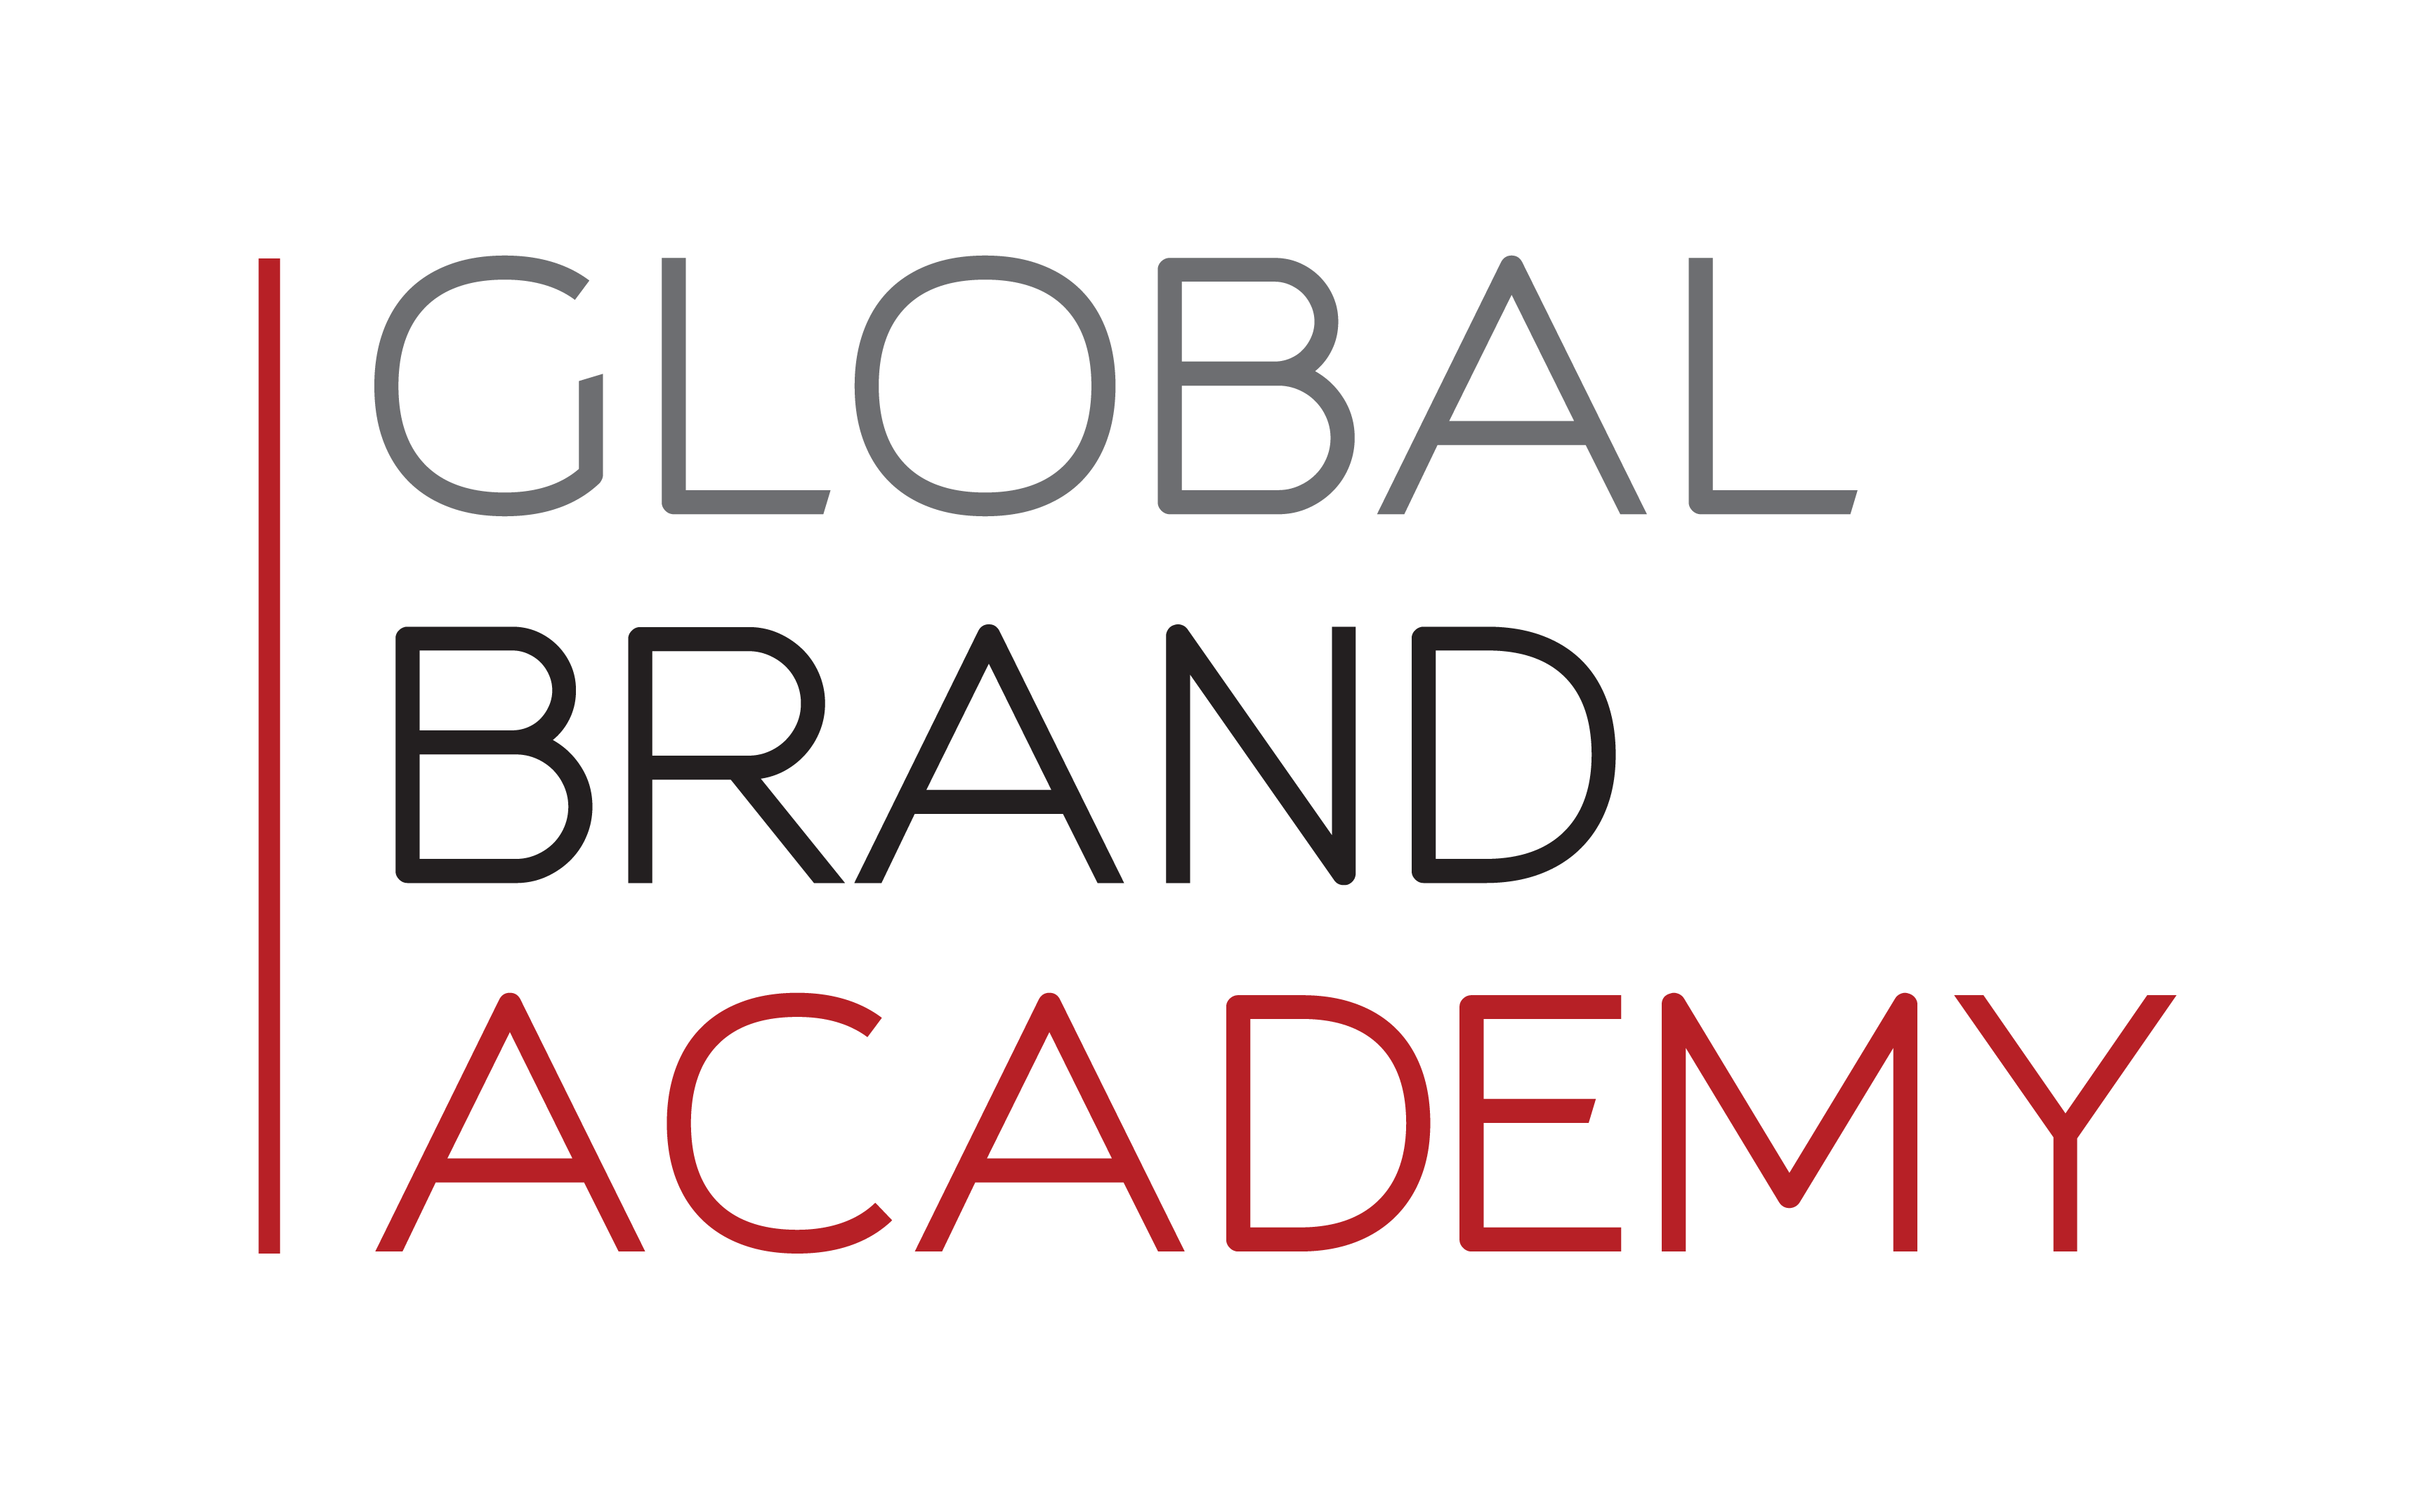 Global Brand Academy Logo